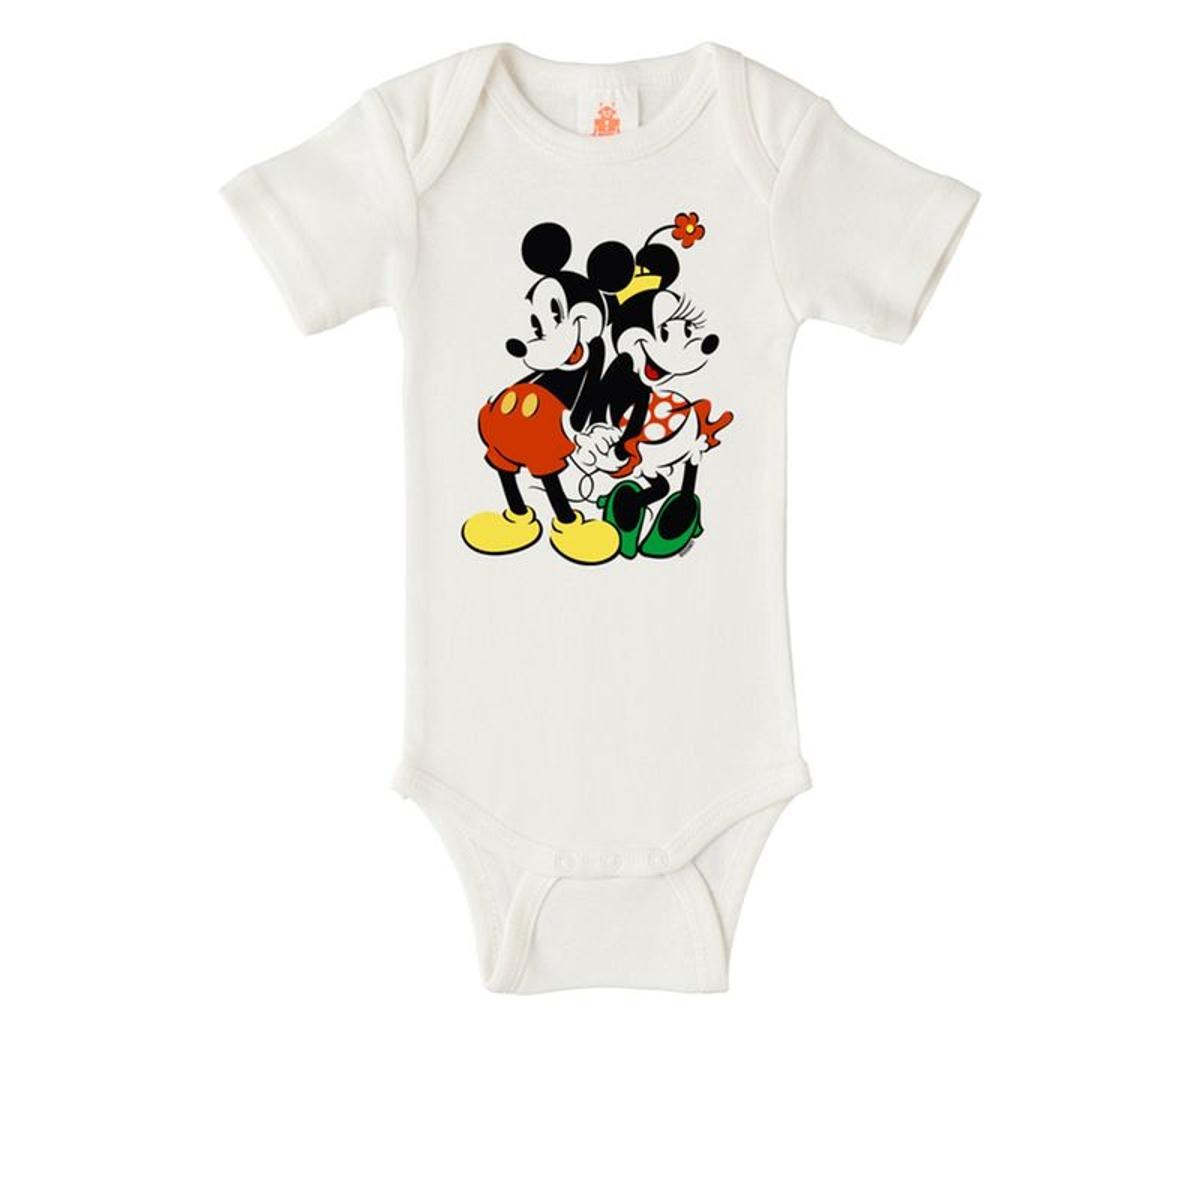 Body bébé Mickey Mouse - Disney - Minnie & Mickey -  vieux blanc